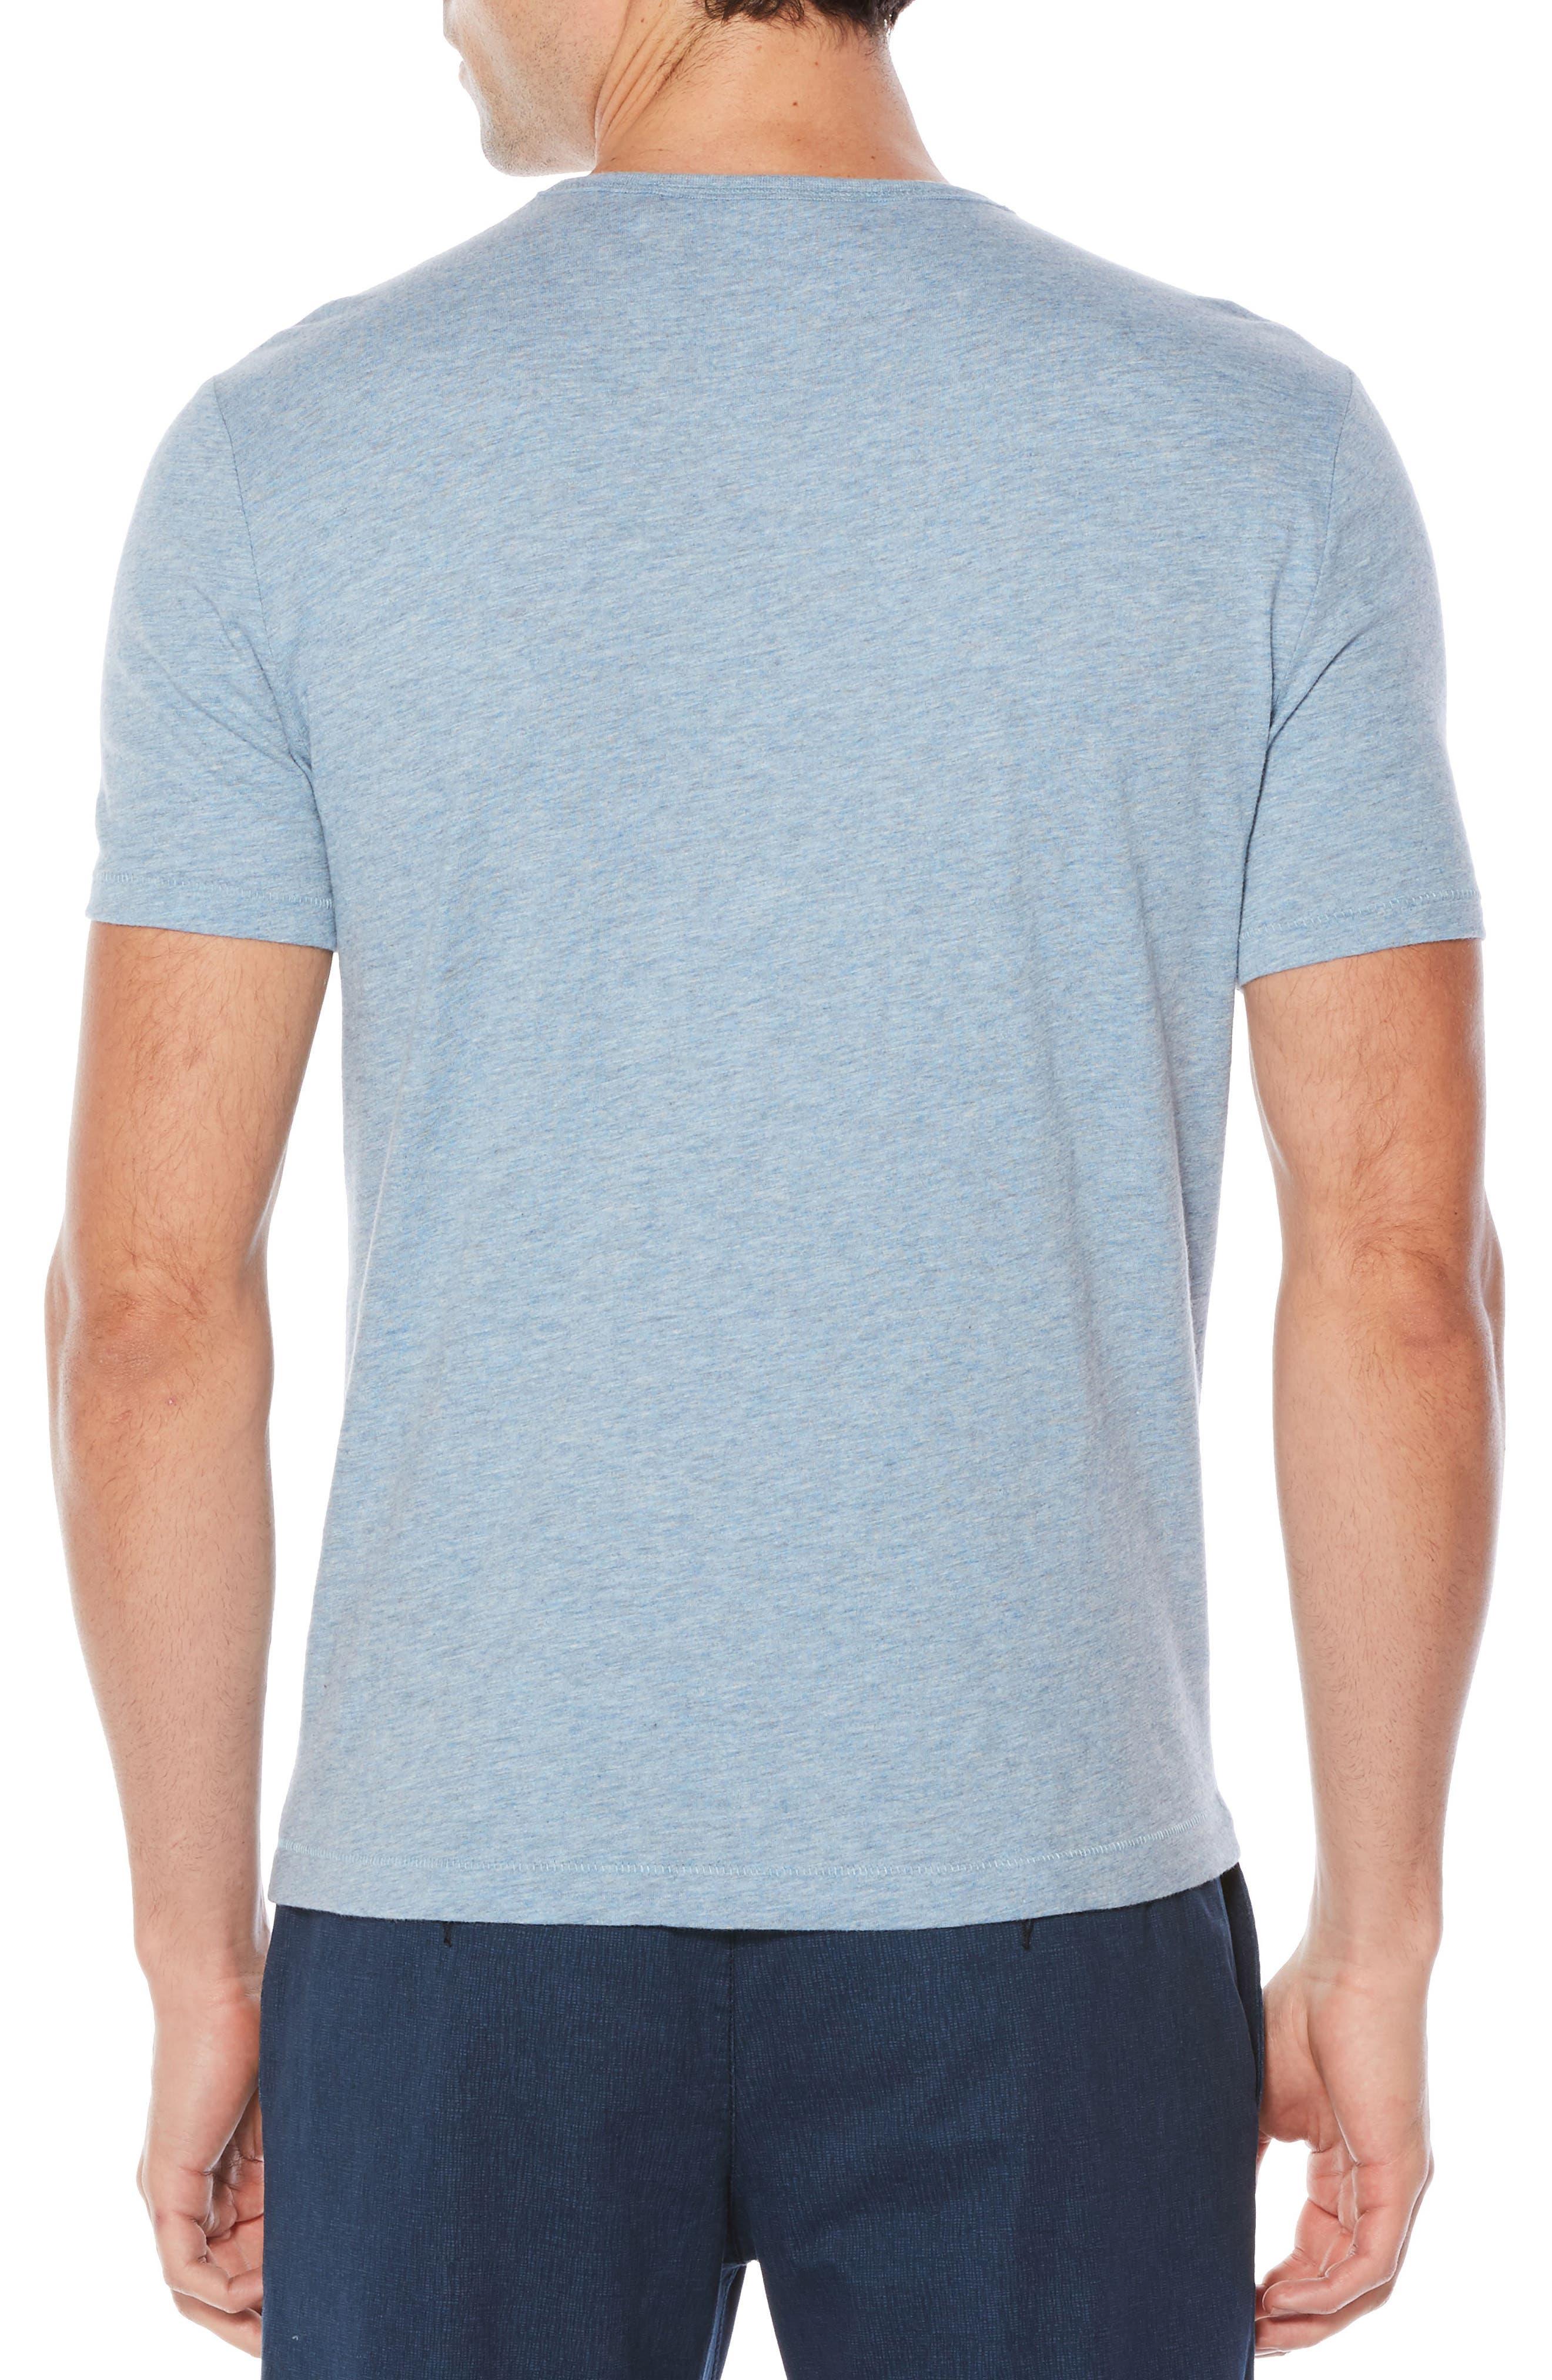 Bing V-Neck T-Shirt,                             Alternate thumbnail 4, color,